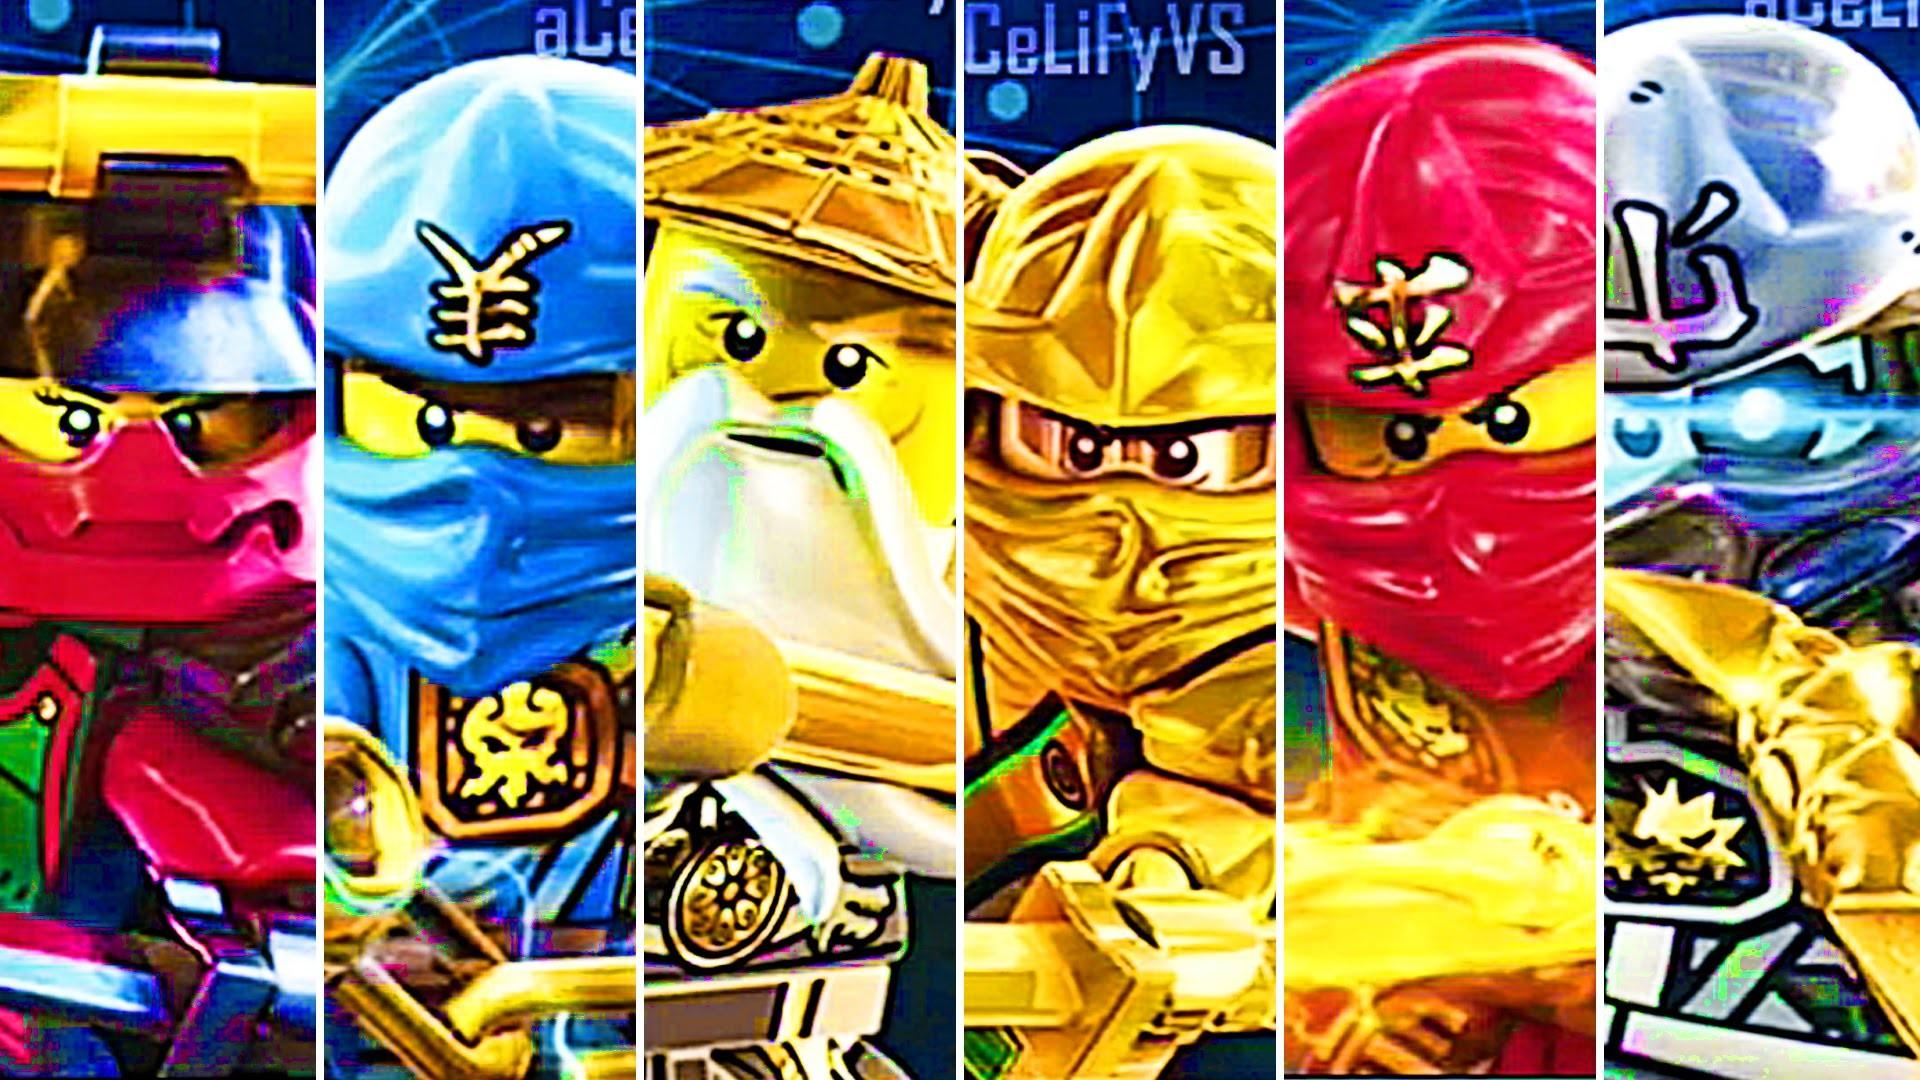 Quizz ninjago saison 3 sur 4 quiz dessins anim s - Ninjago saison 7 ...